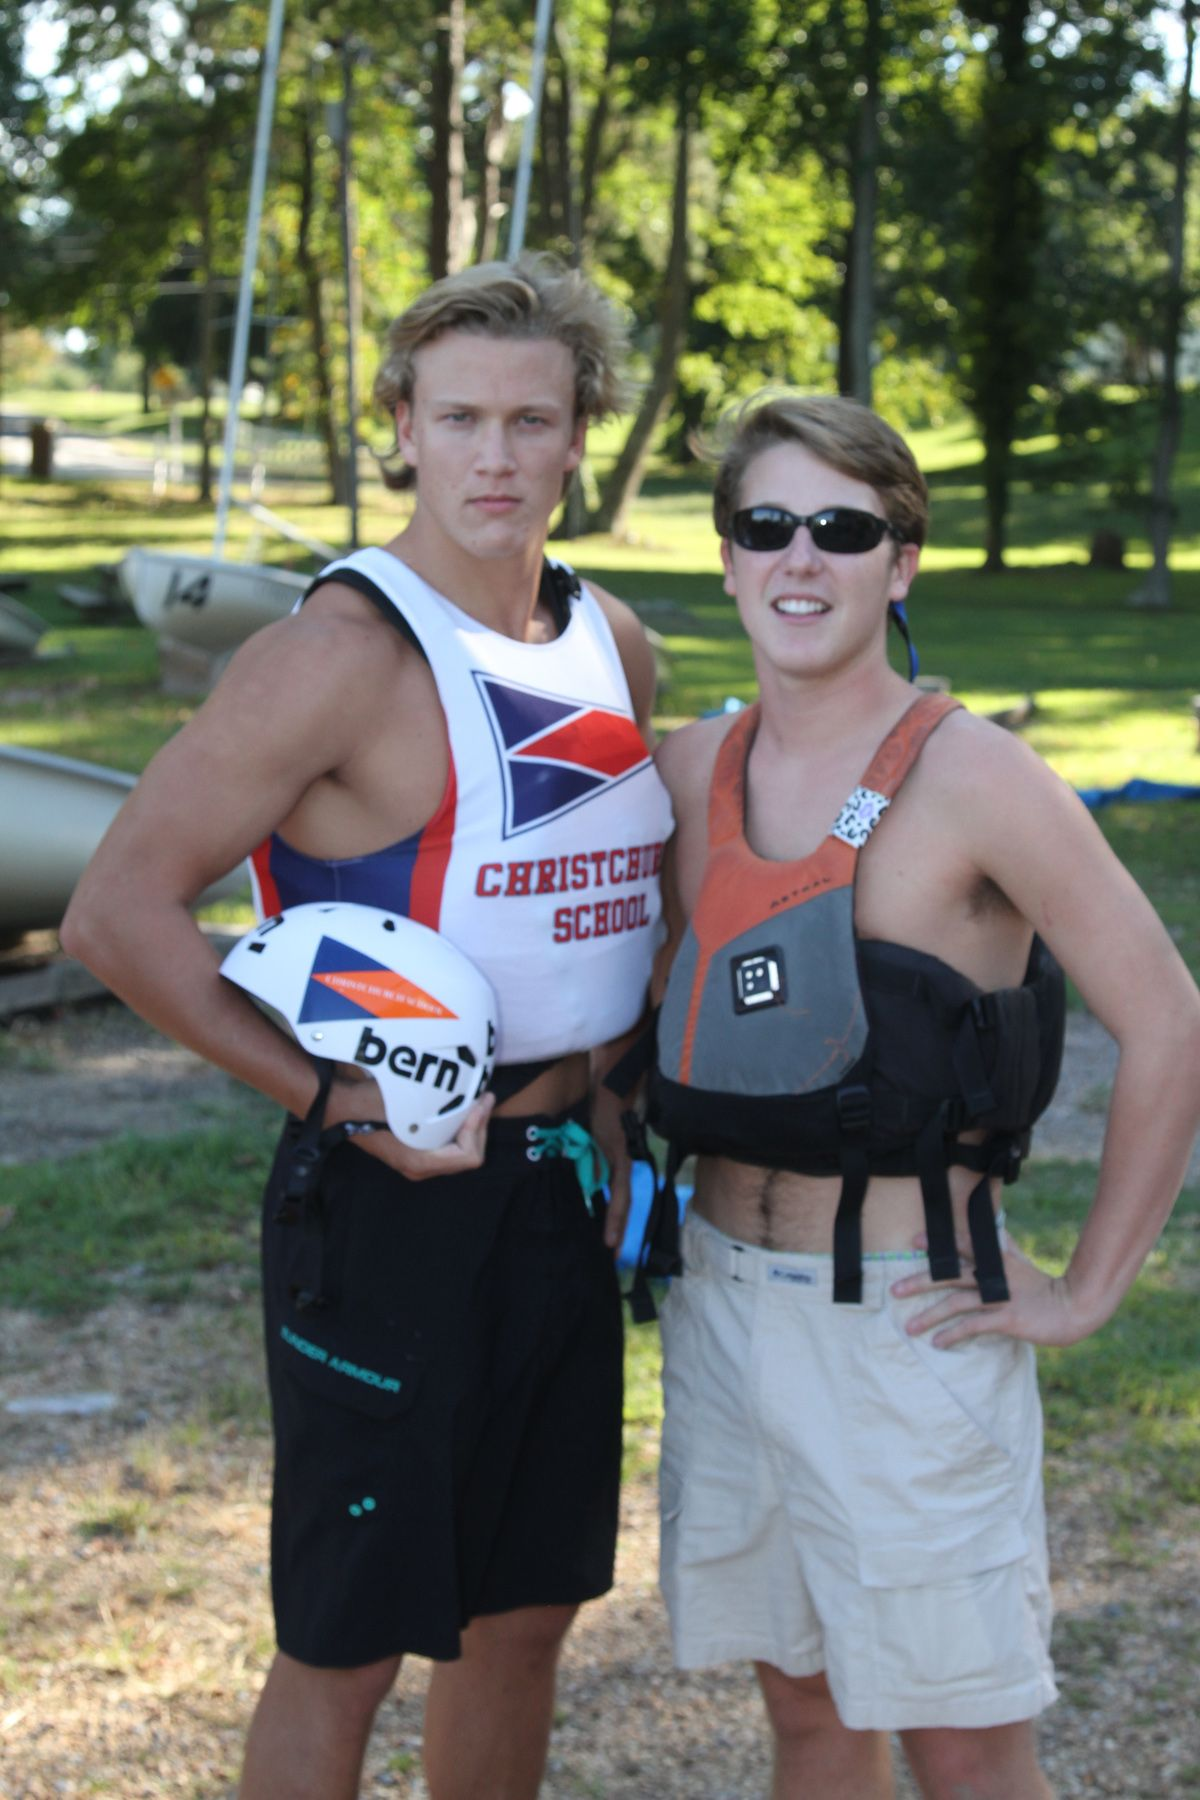 Christchurch School Photo Gallery Andrew Smith Bermuda Shorts Navy 38 Jv Sailing Team 2015